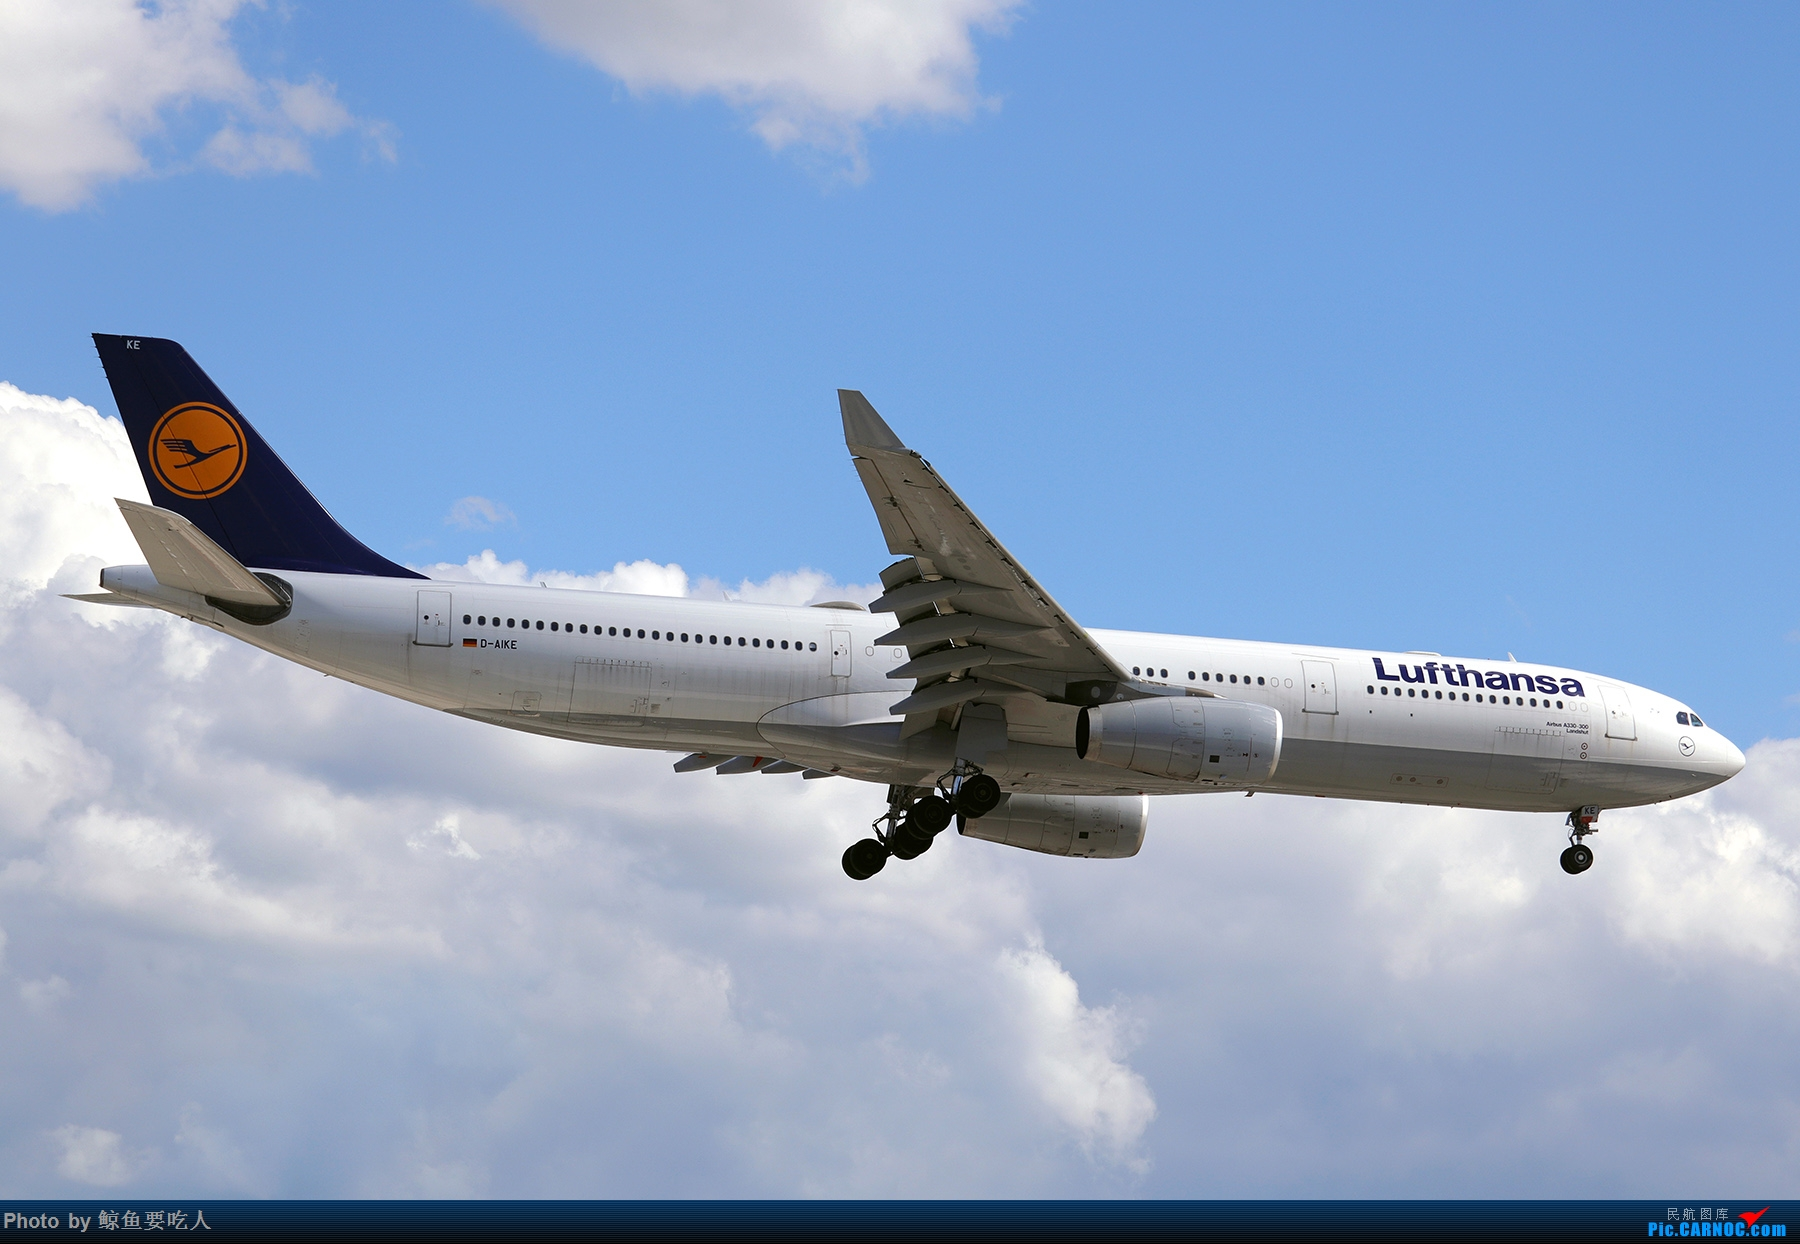 Re:[原创]【多图党】见证疫情后逐步的恢复,加拿大夏日多伦多皮尔逊机场拍机~ 乐见诸航空公司复航多伦多 AIRBUS A330-300 D-AIKE 多伦多皮尔逊国际机场